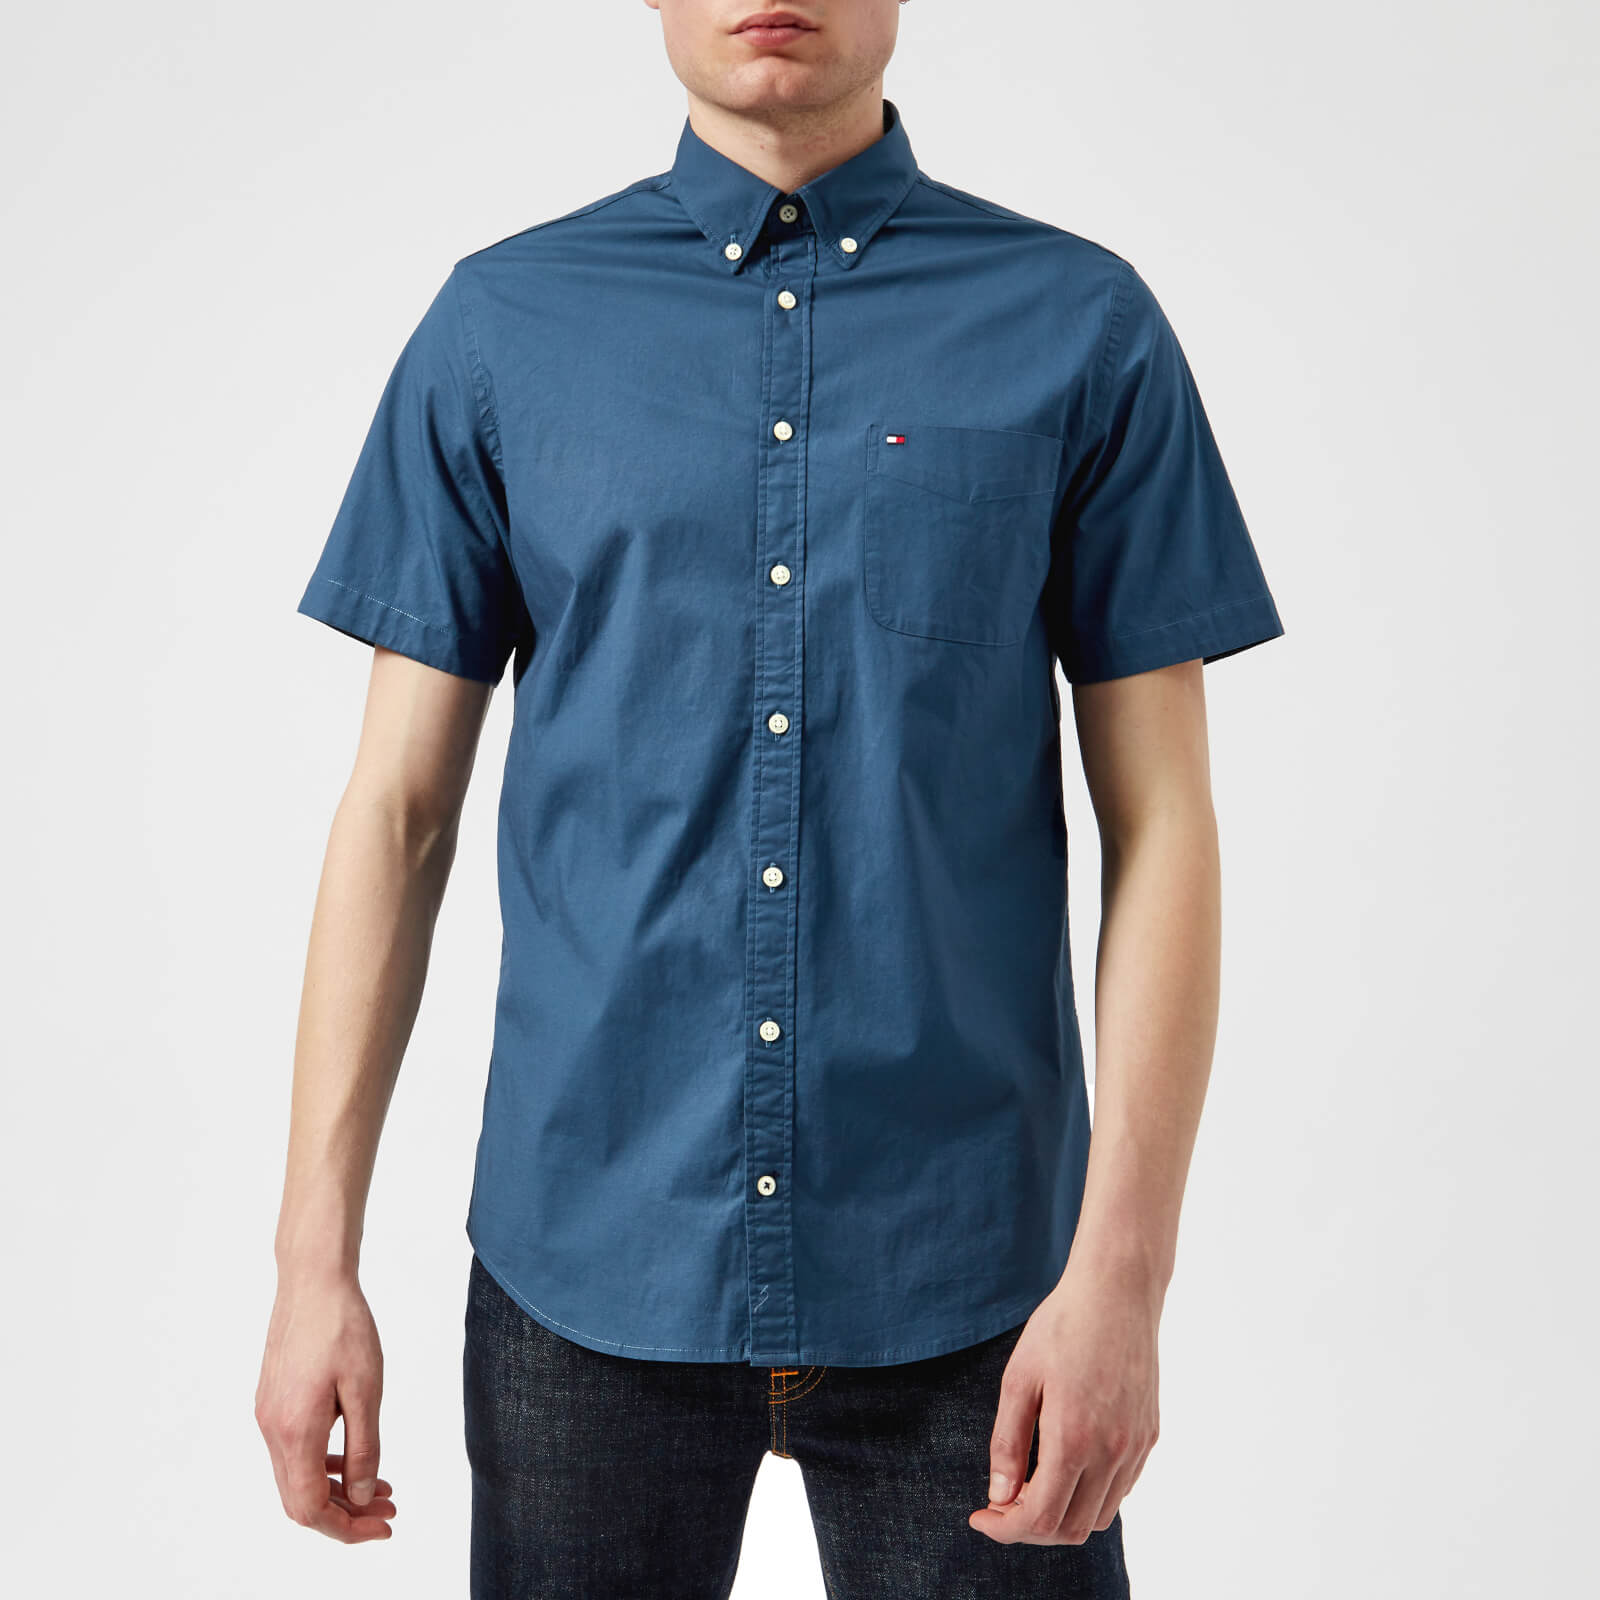 dede0e63 Tommy Hilfiger Men's Stretch Poplin Short Sleeve Shirt - Dark Denim Mens  Clothing | TheHut.com